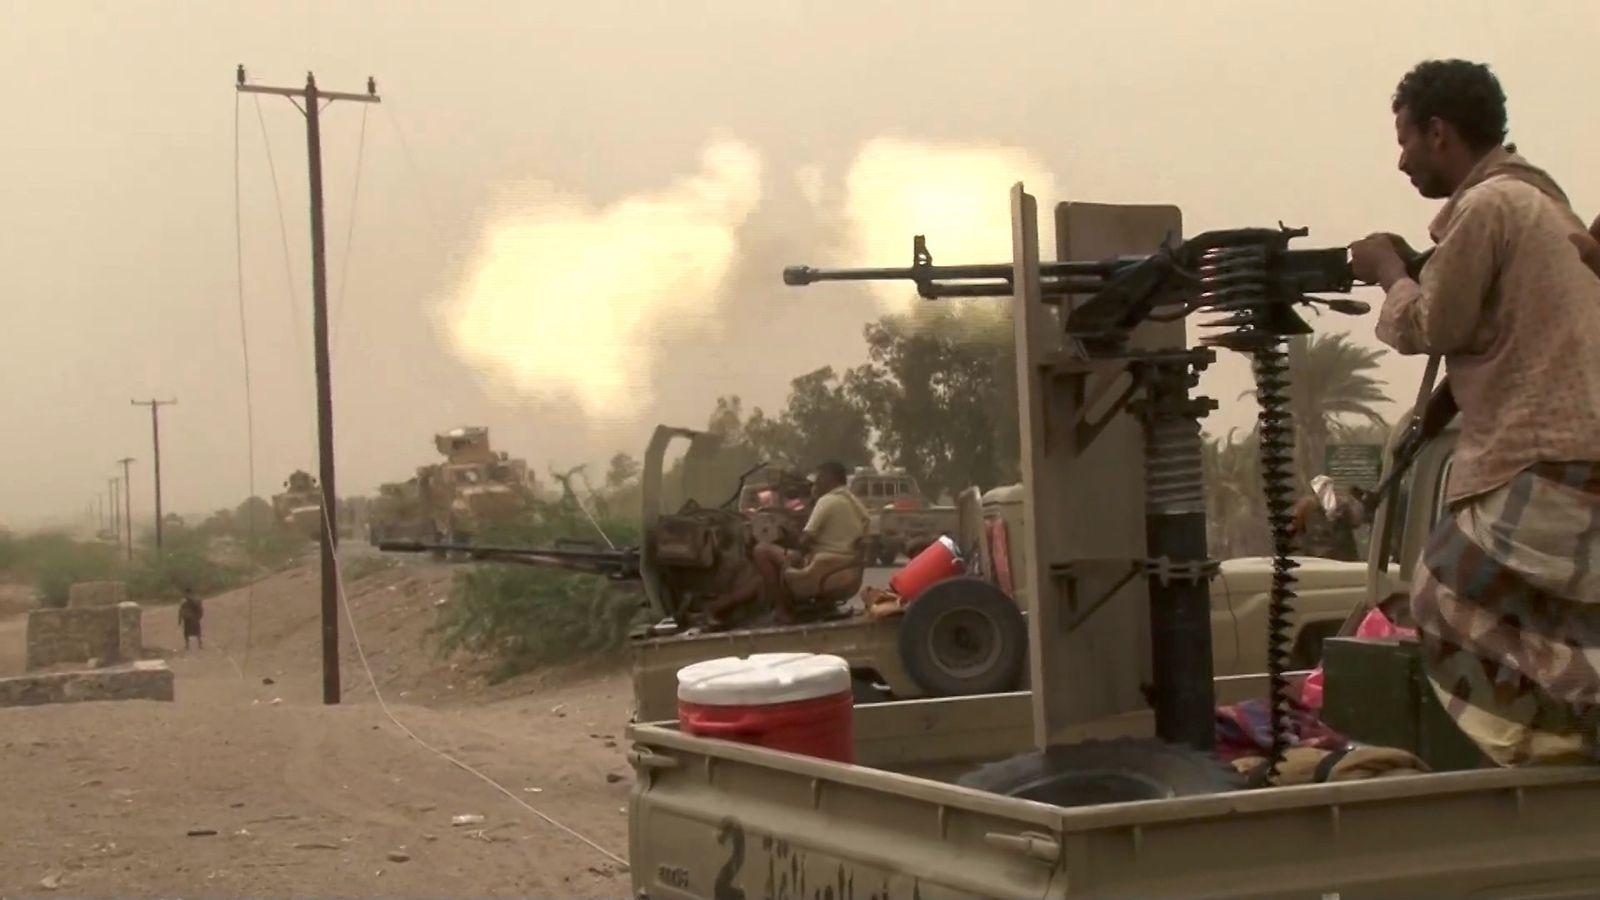 Yemen conflict: Saudi-led forces 'seize control of Hodeida airport'